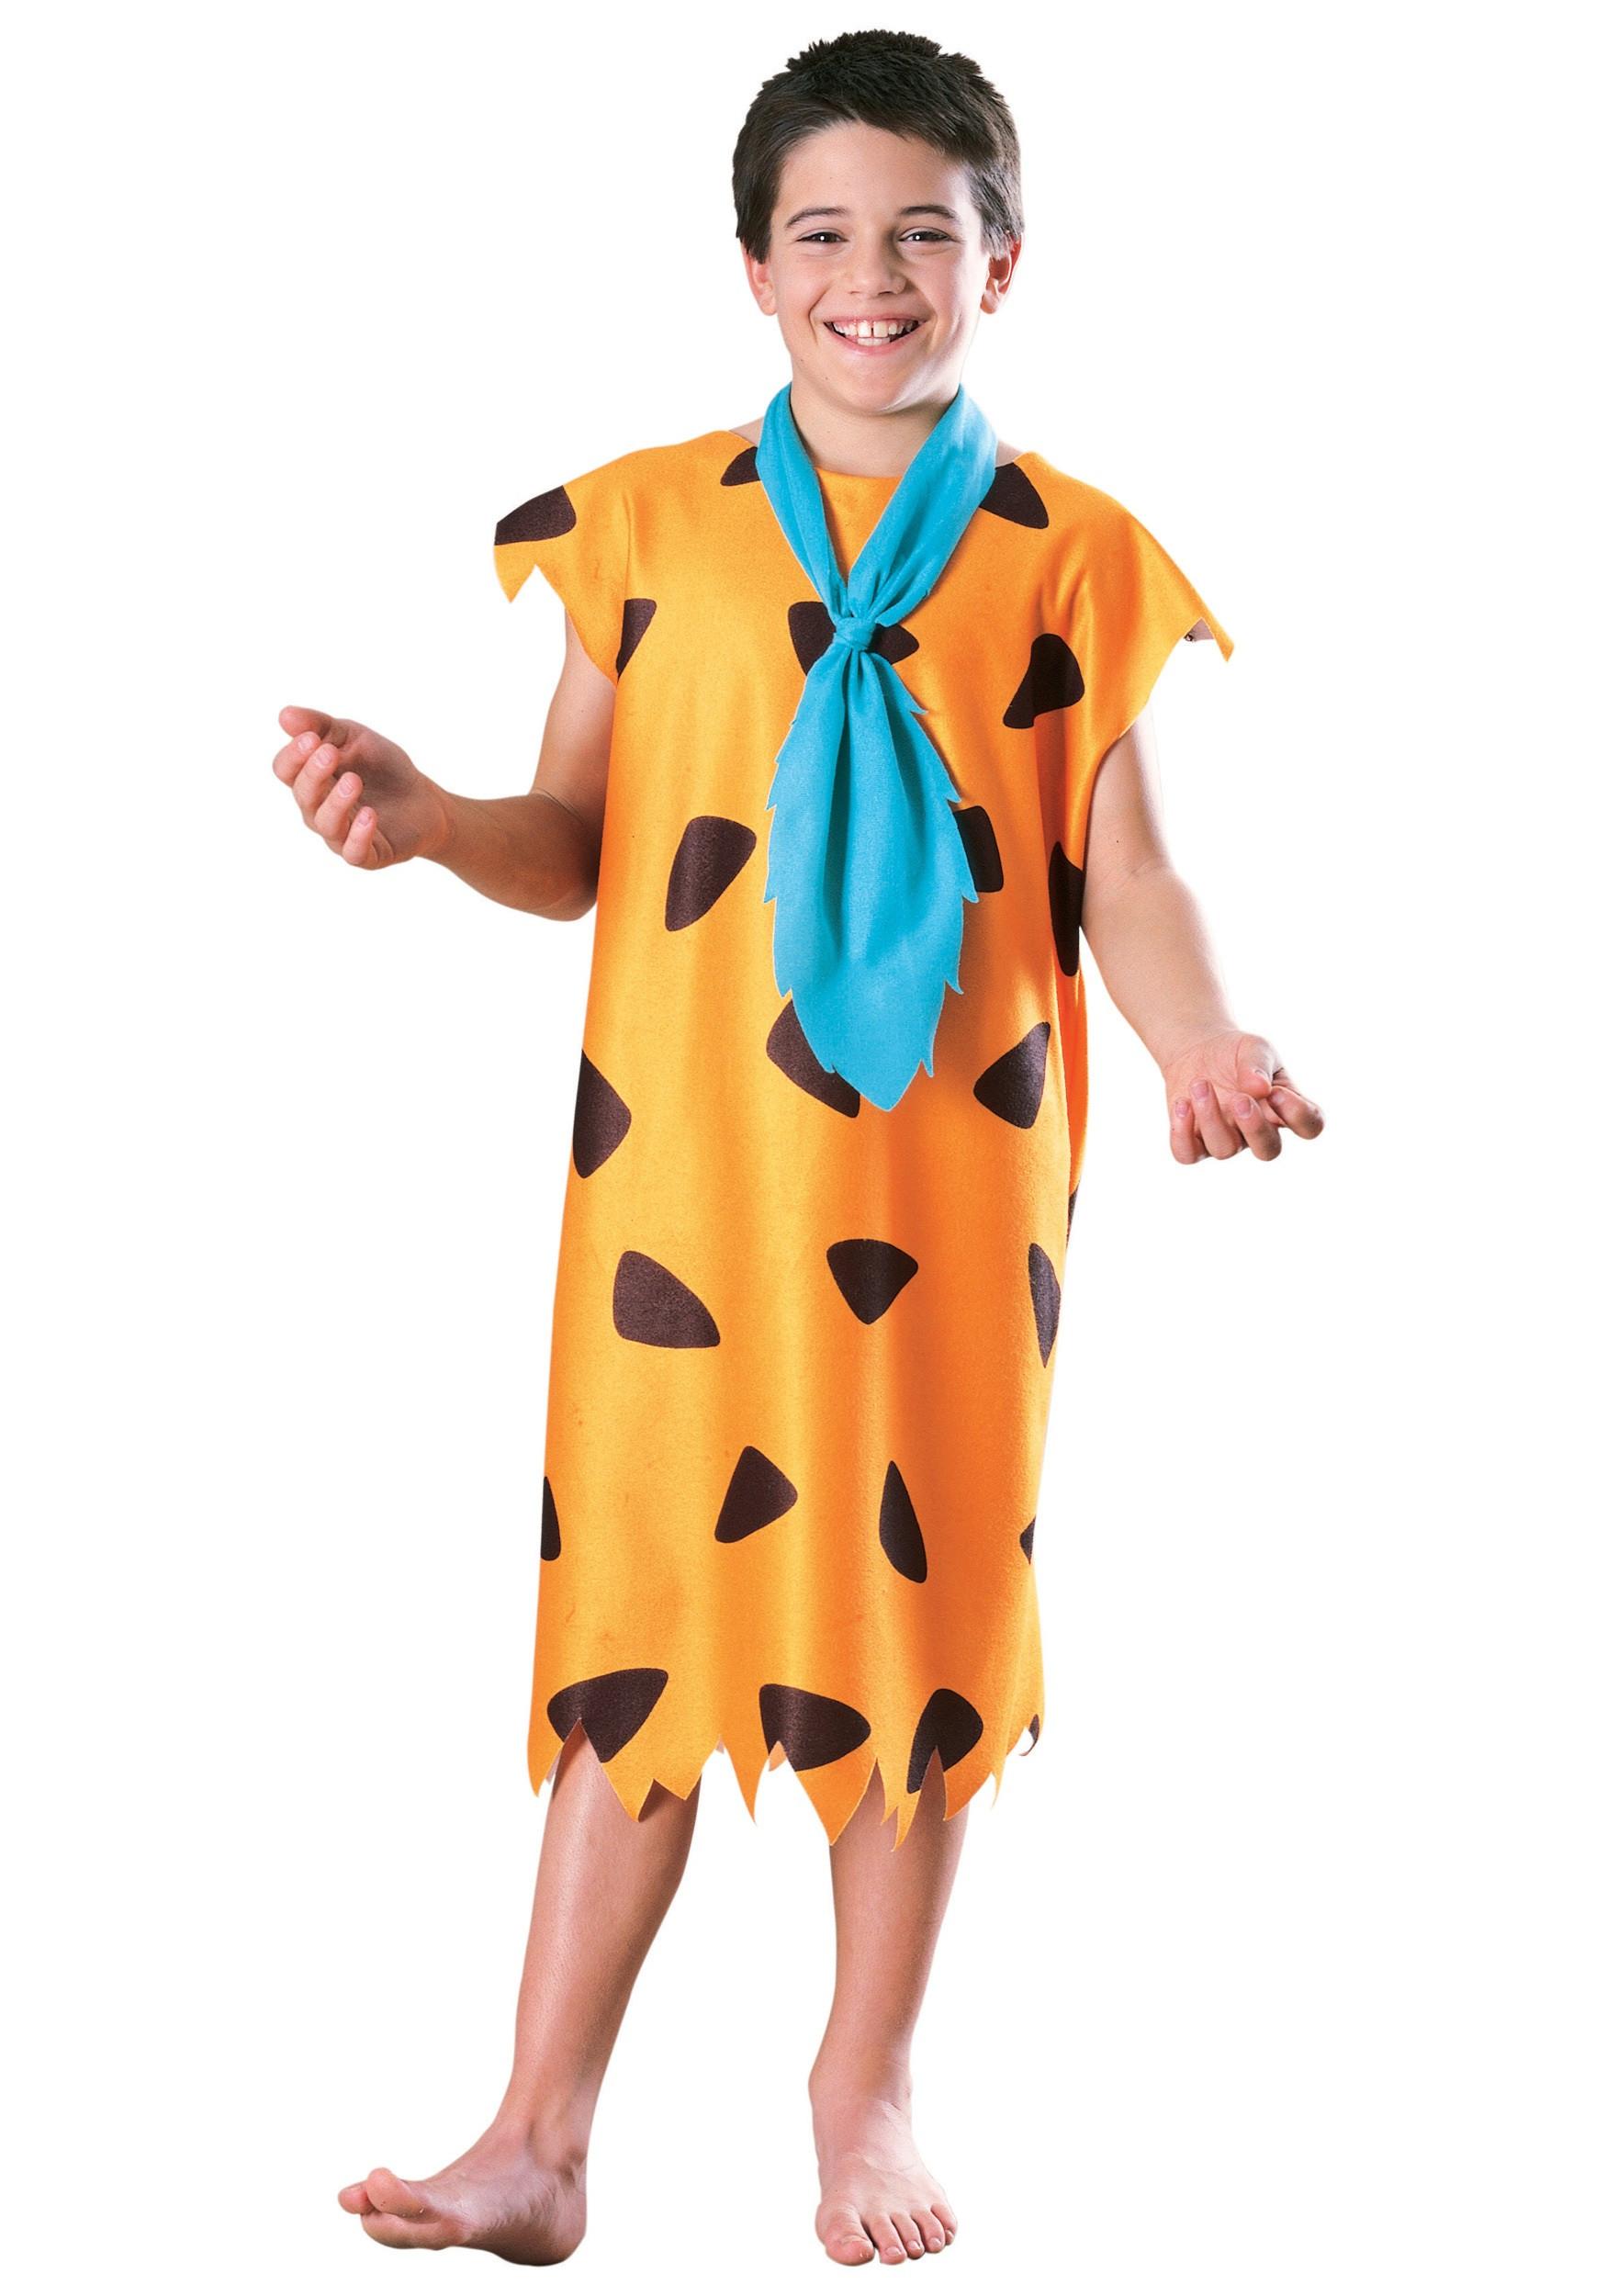 Flintstones Costumes DIY  Kids Fred Flintstone Costume